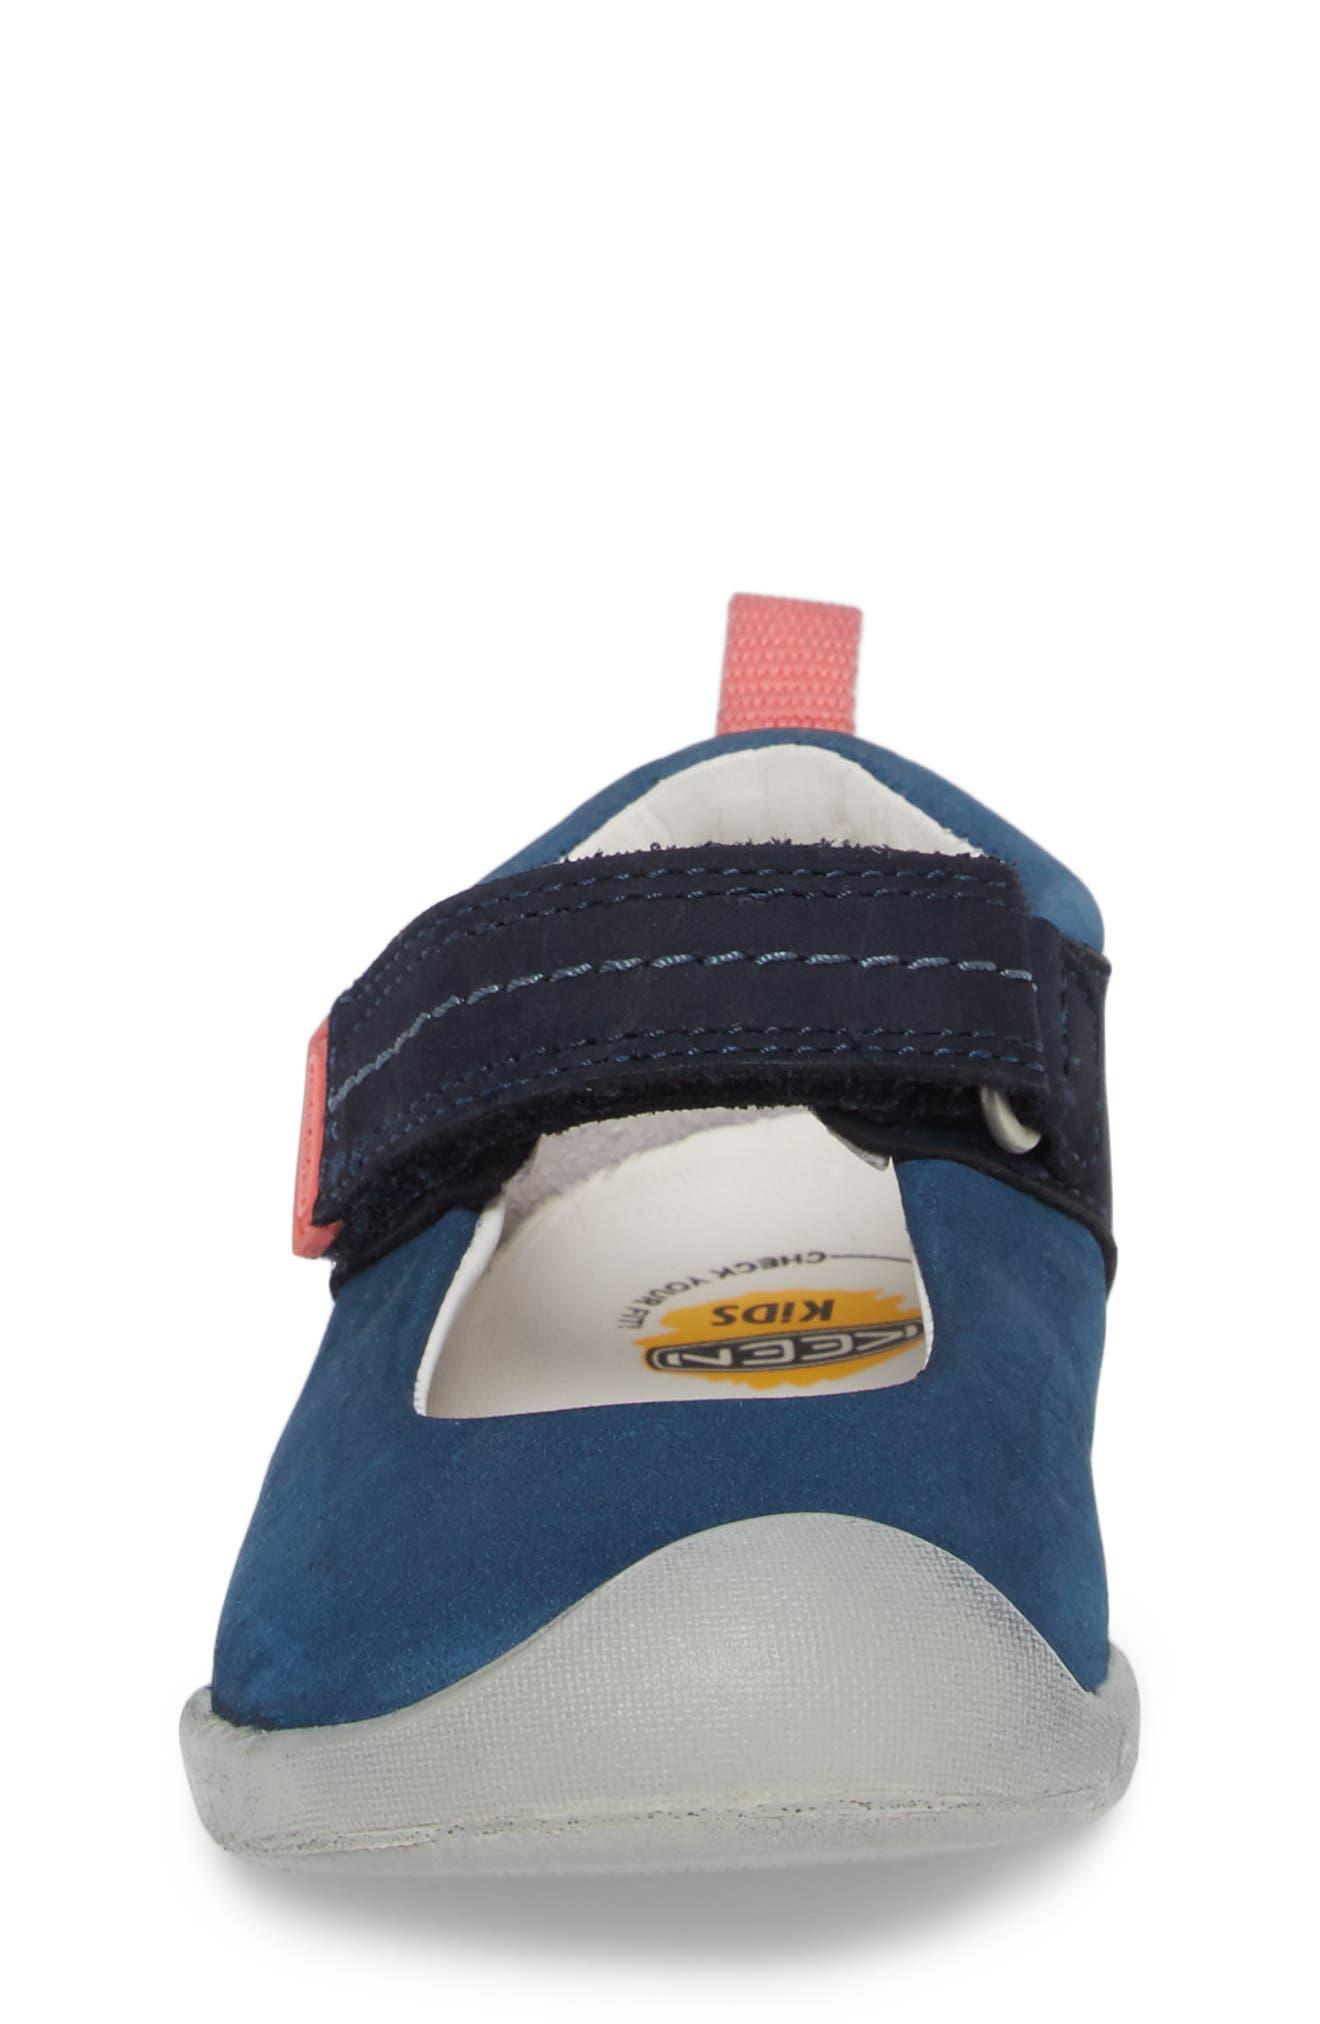 Pep Mary Jane-T Sneaker,                             Alternate thumbnail 4, color,                             Dress Blues/ Sugar Coral